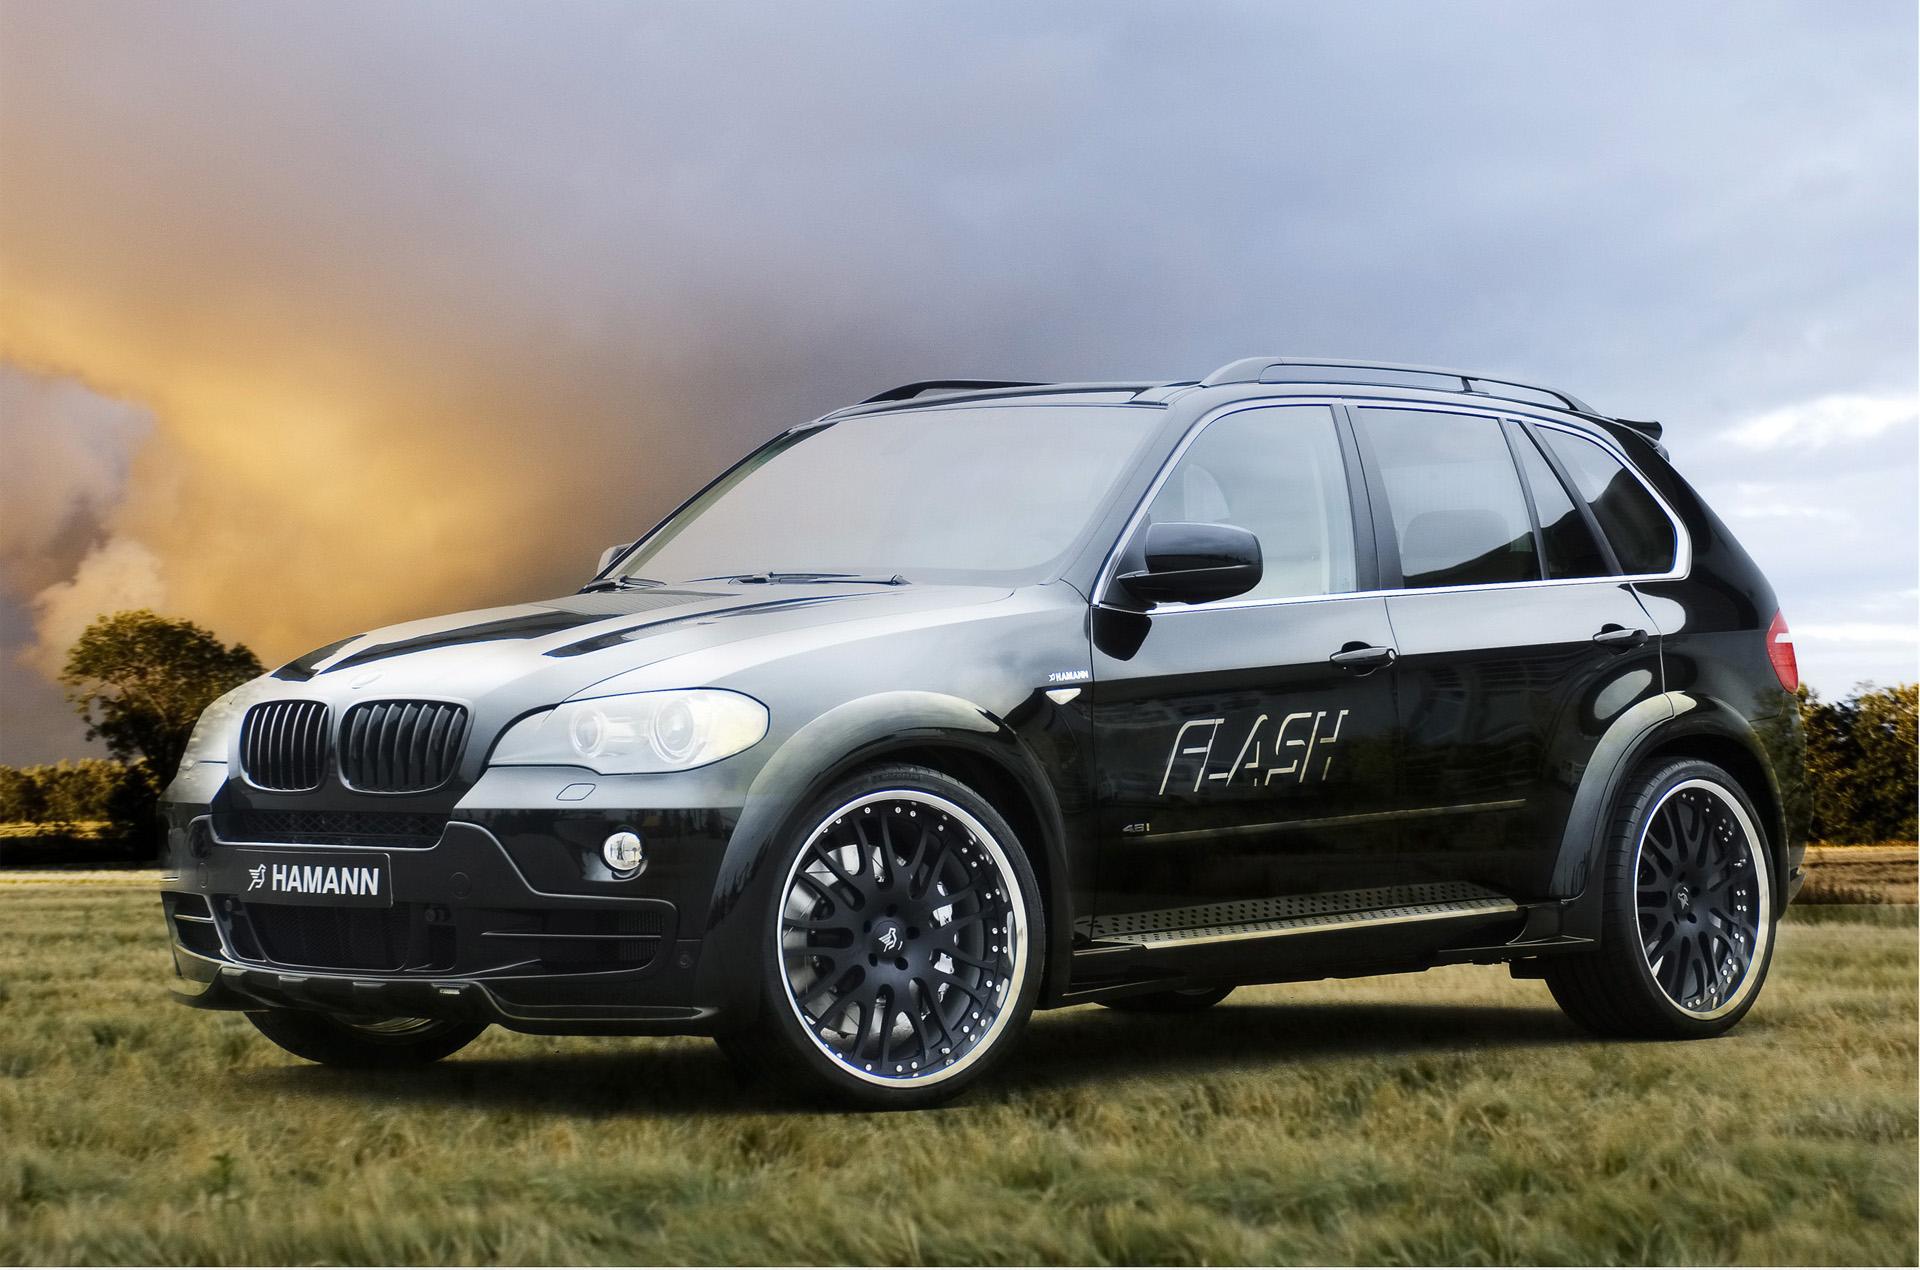 Hamann BMW X5 Flash photo #1